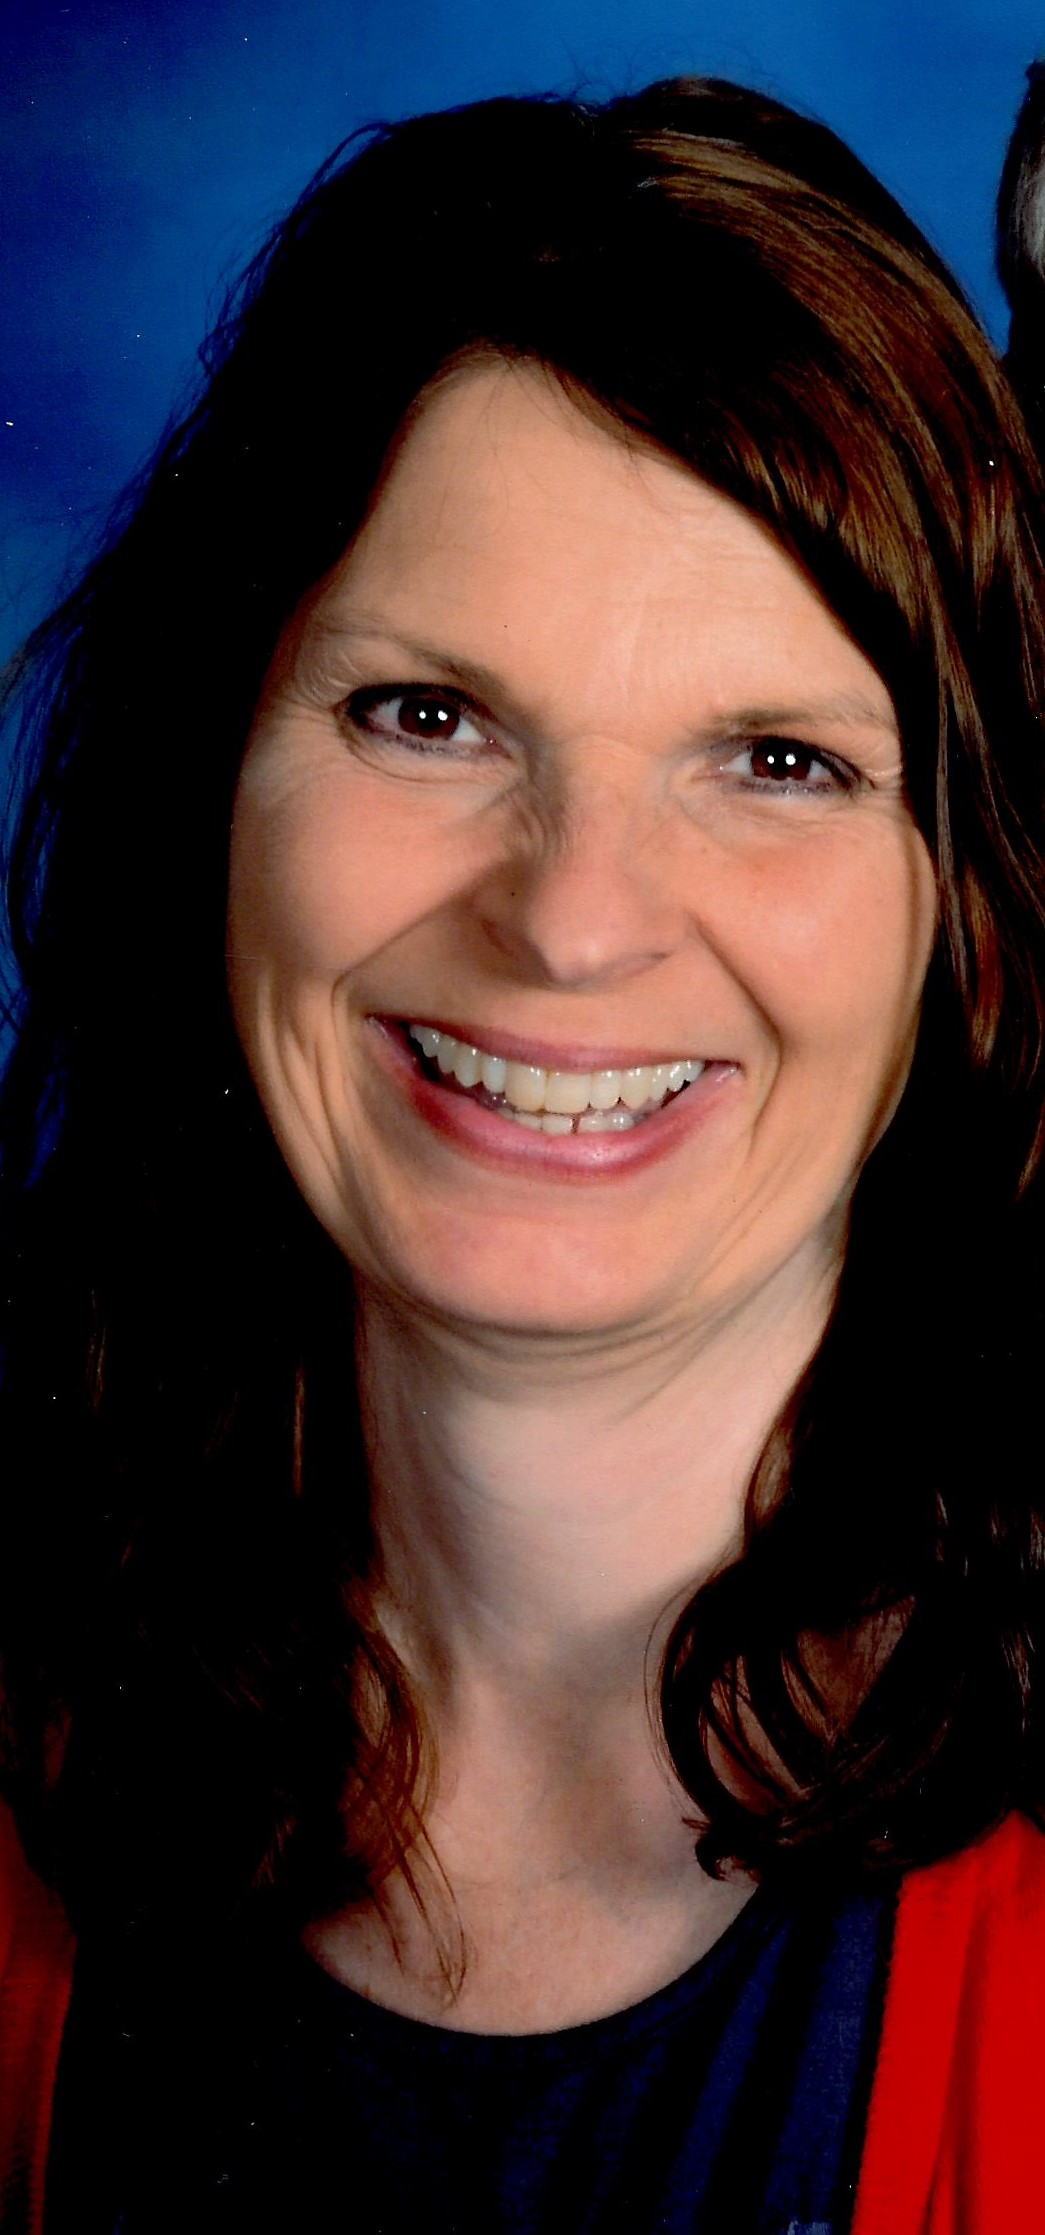 Jana S Unique Hair Salon: Remembering Jana S. Huber